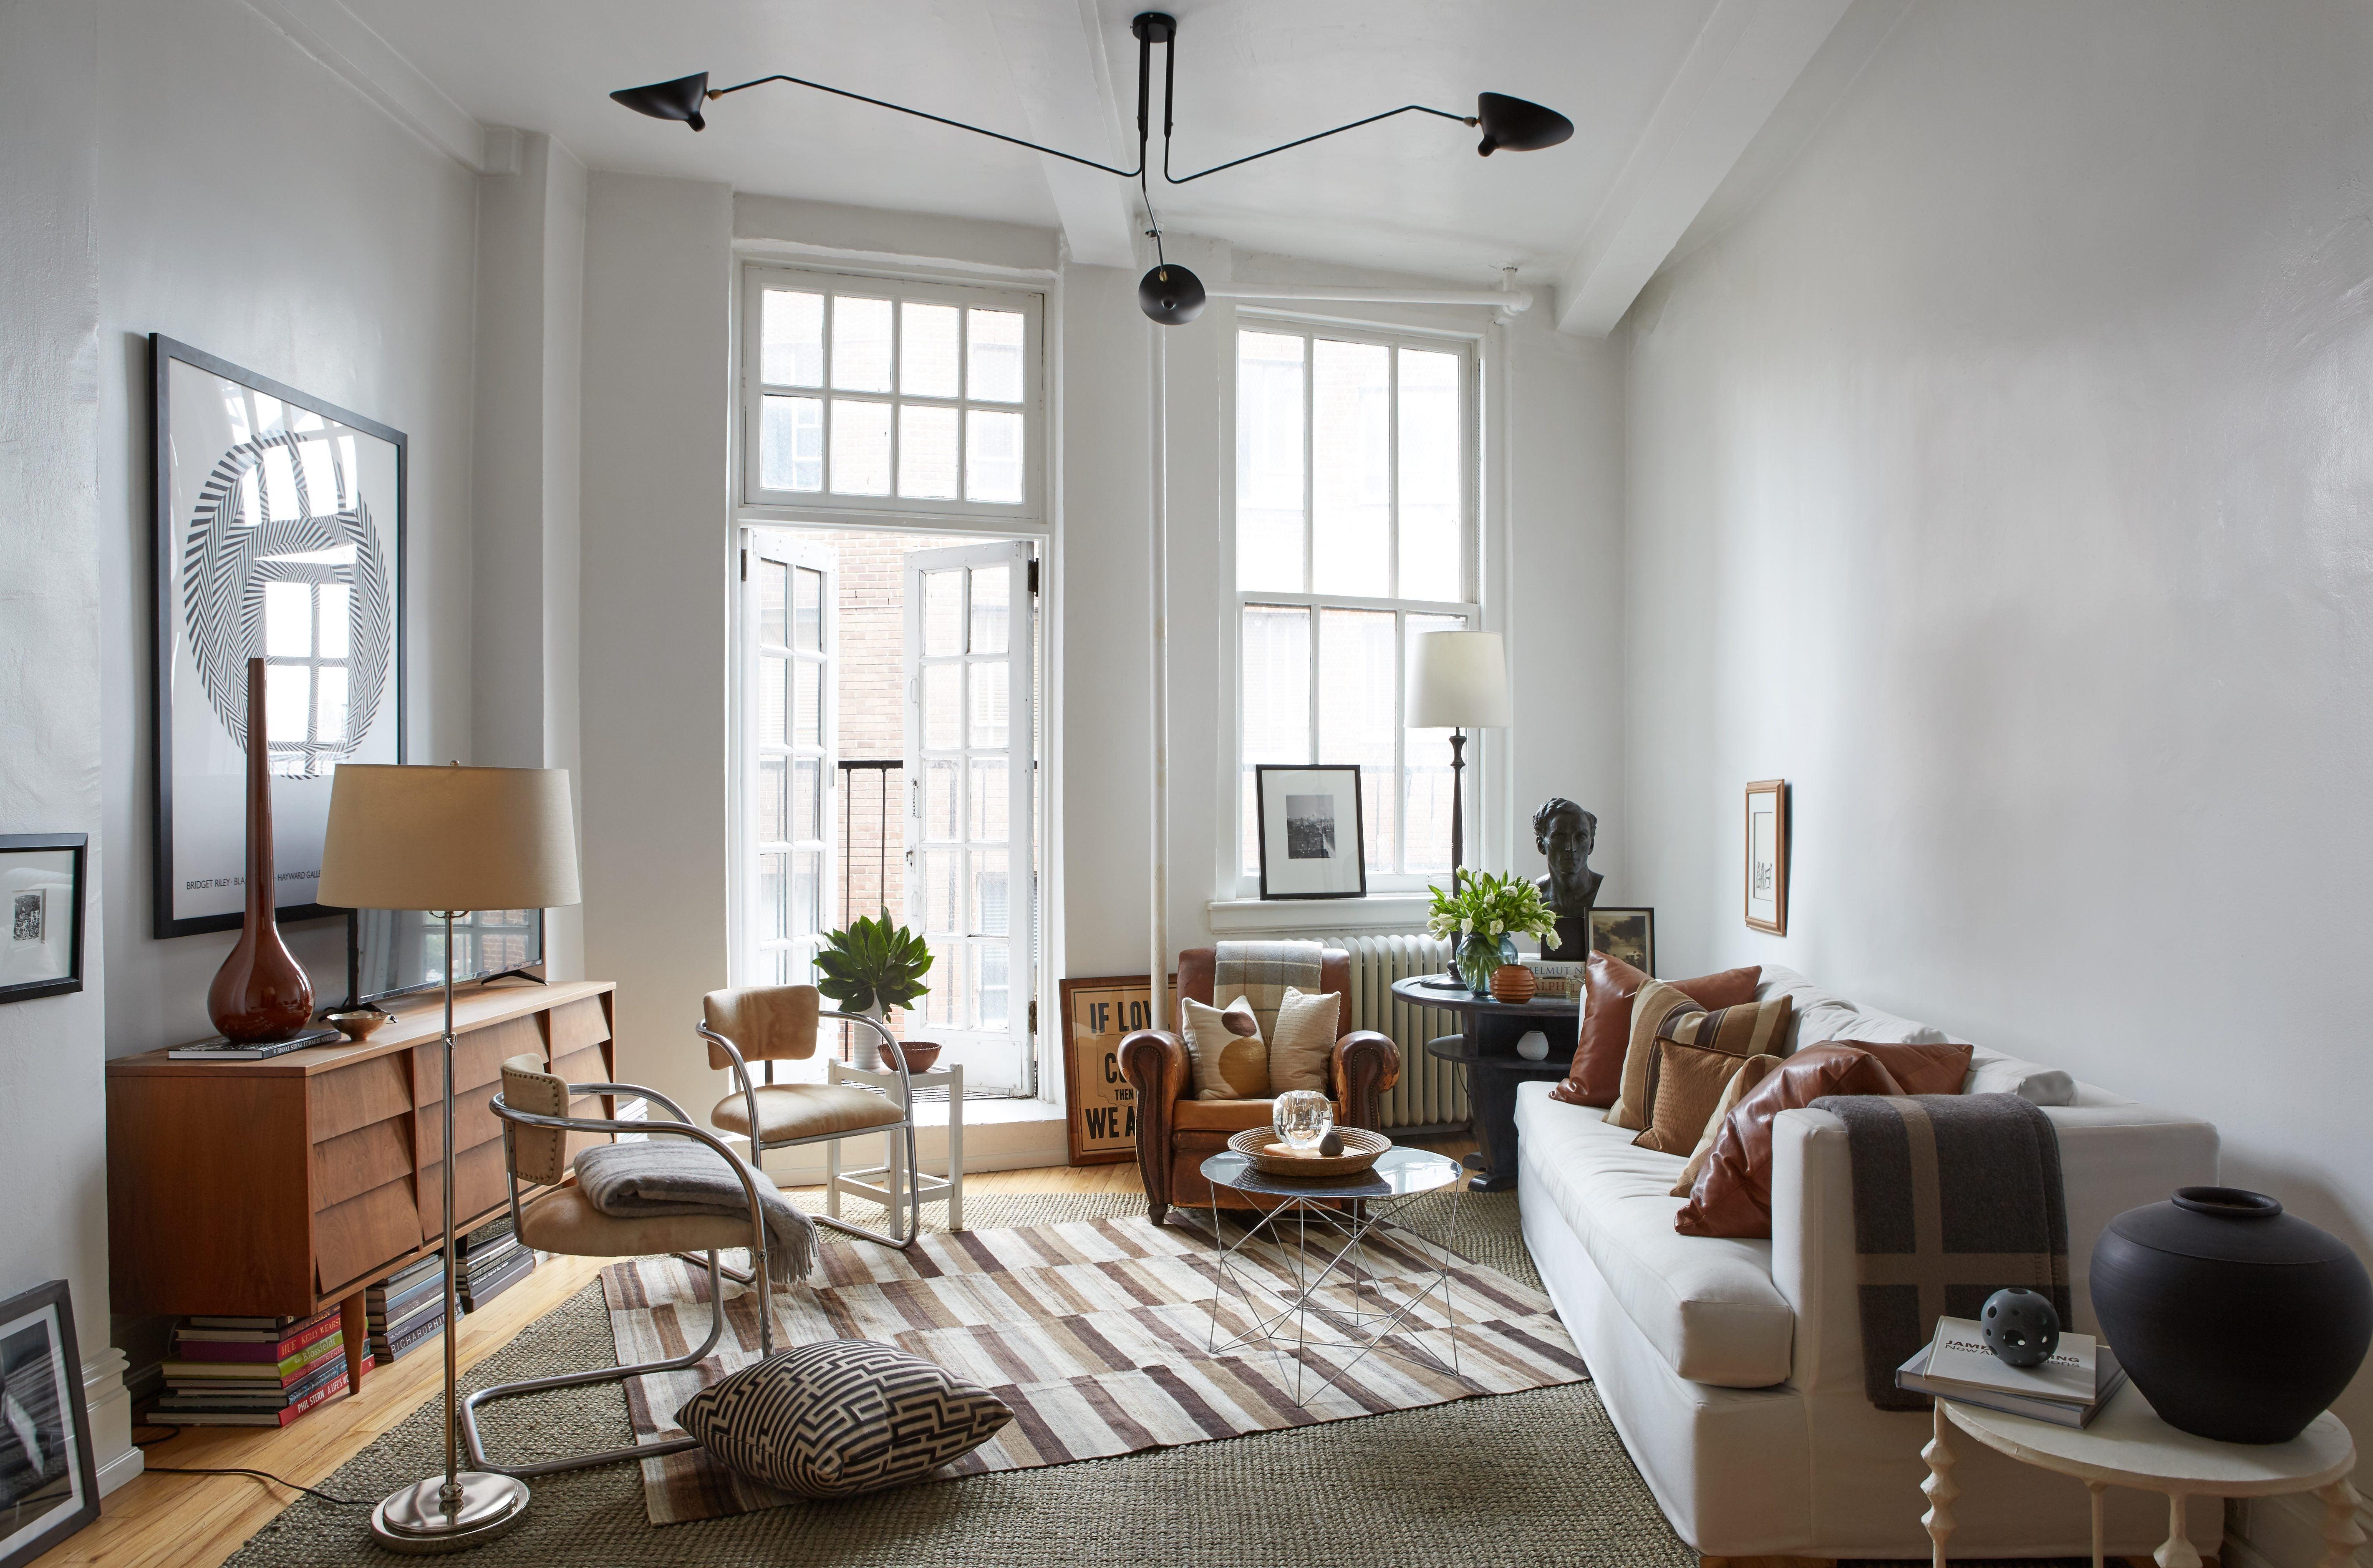 Step Inside Interior Designer Dan Mazzarini's Apartment in New York City